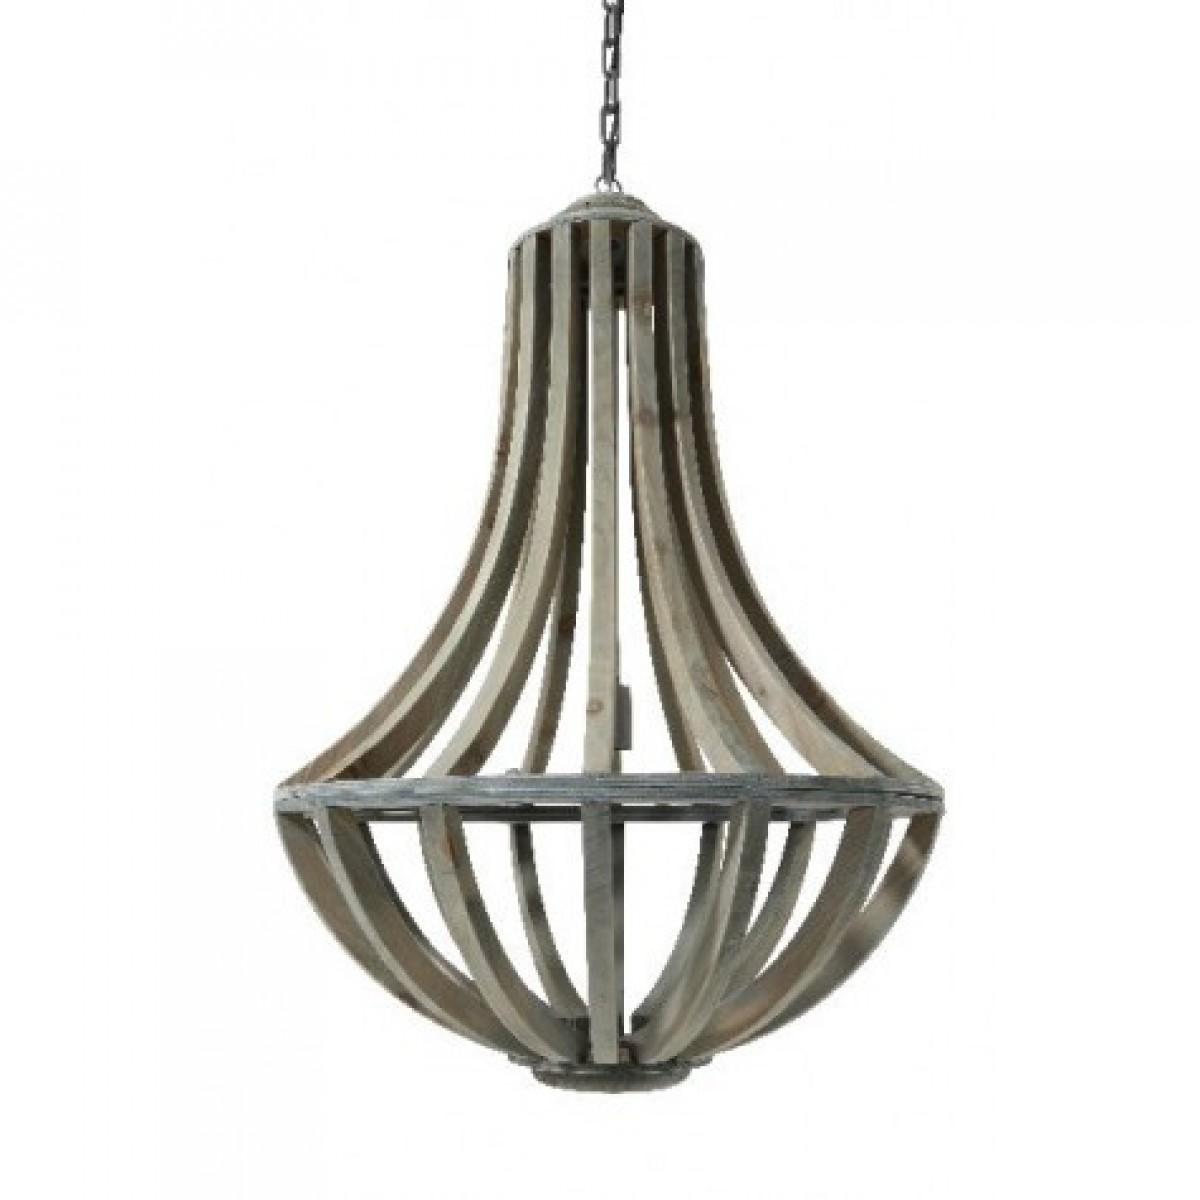 Hängeleuchte Holz pendelleuchte grau holz hängeleuchte grau hängele grau ø 61 cm